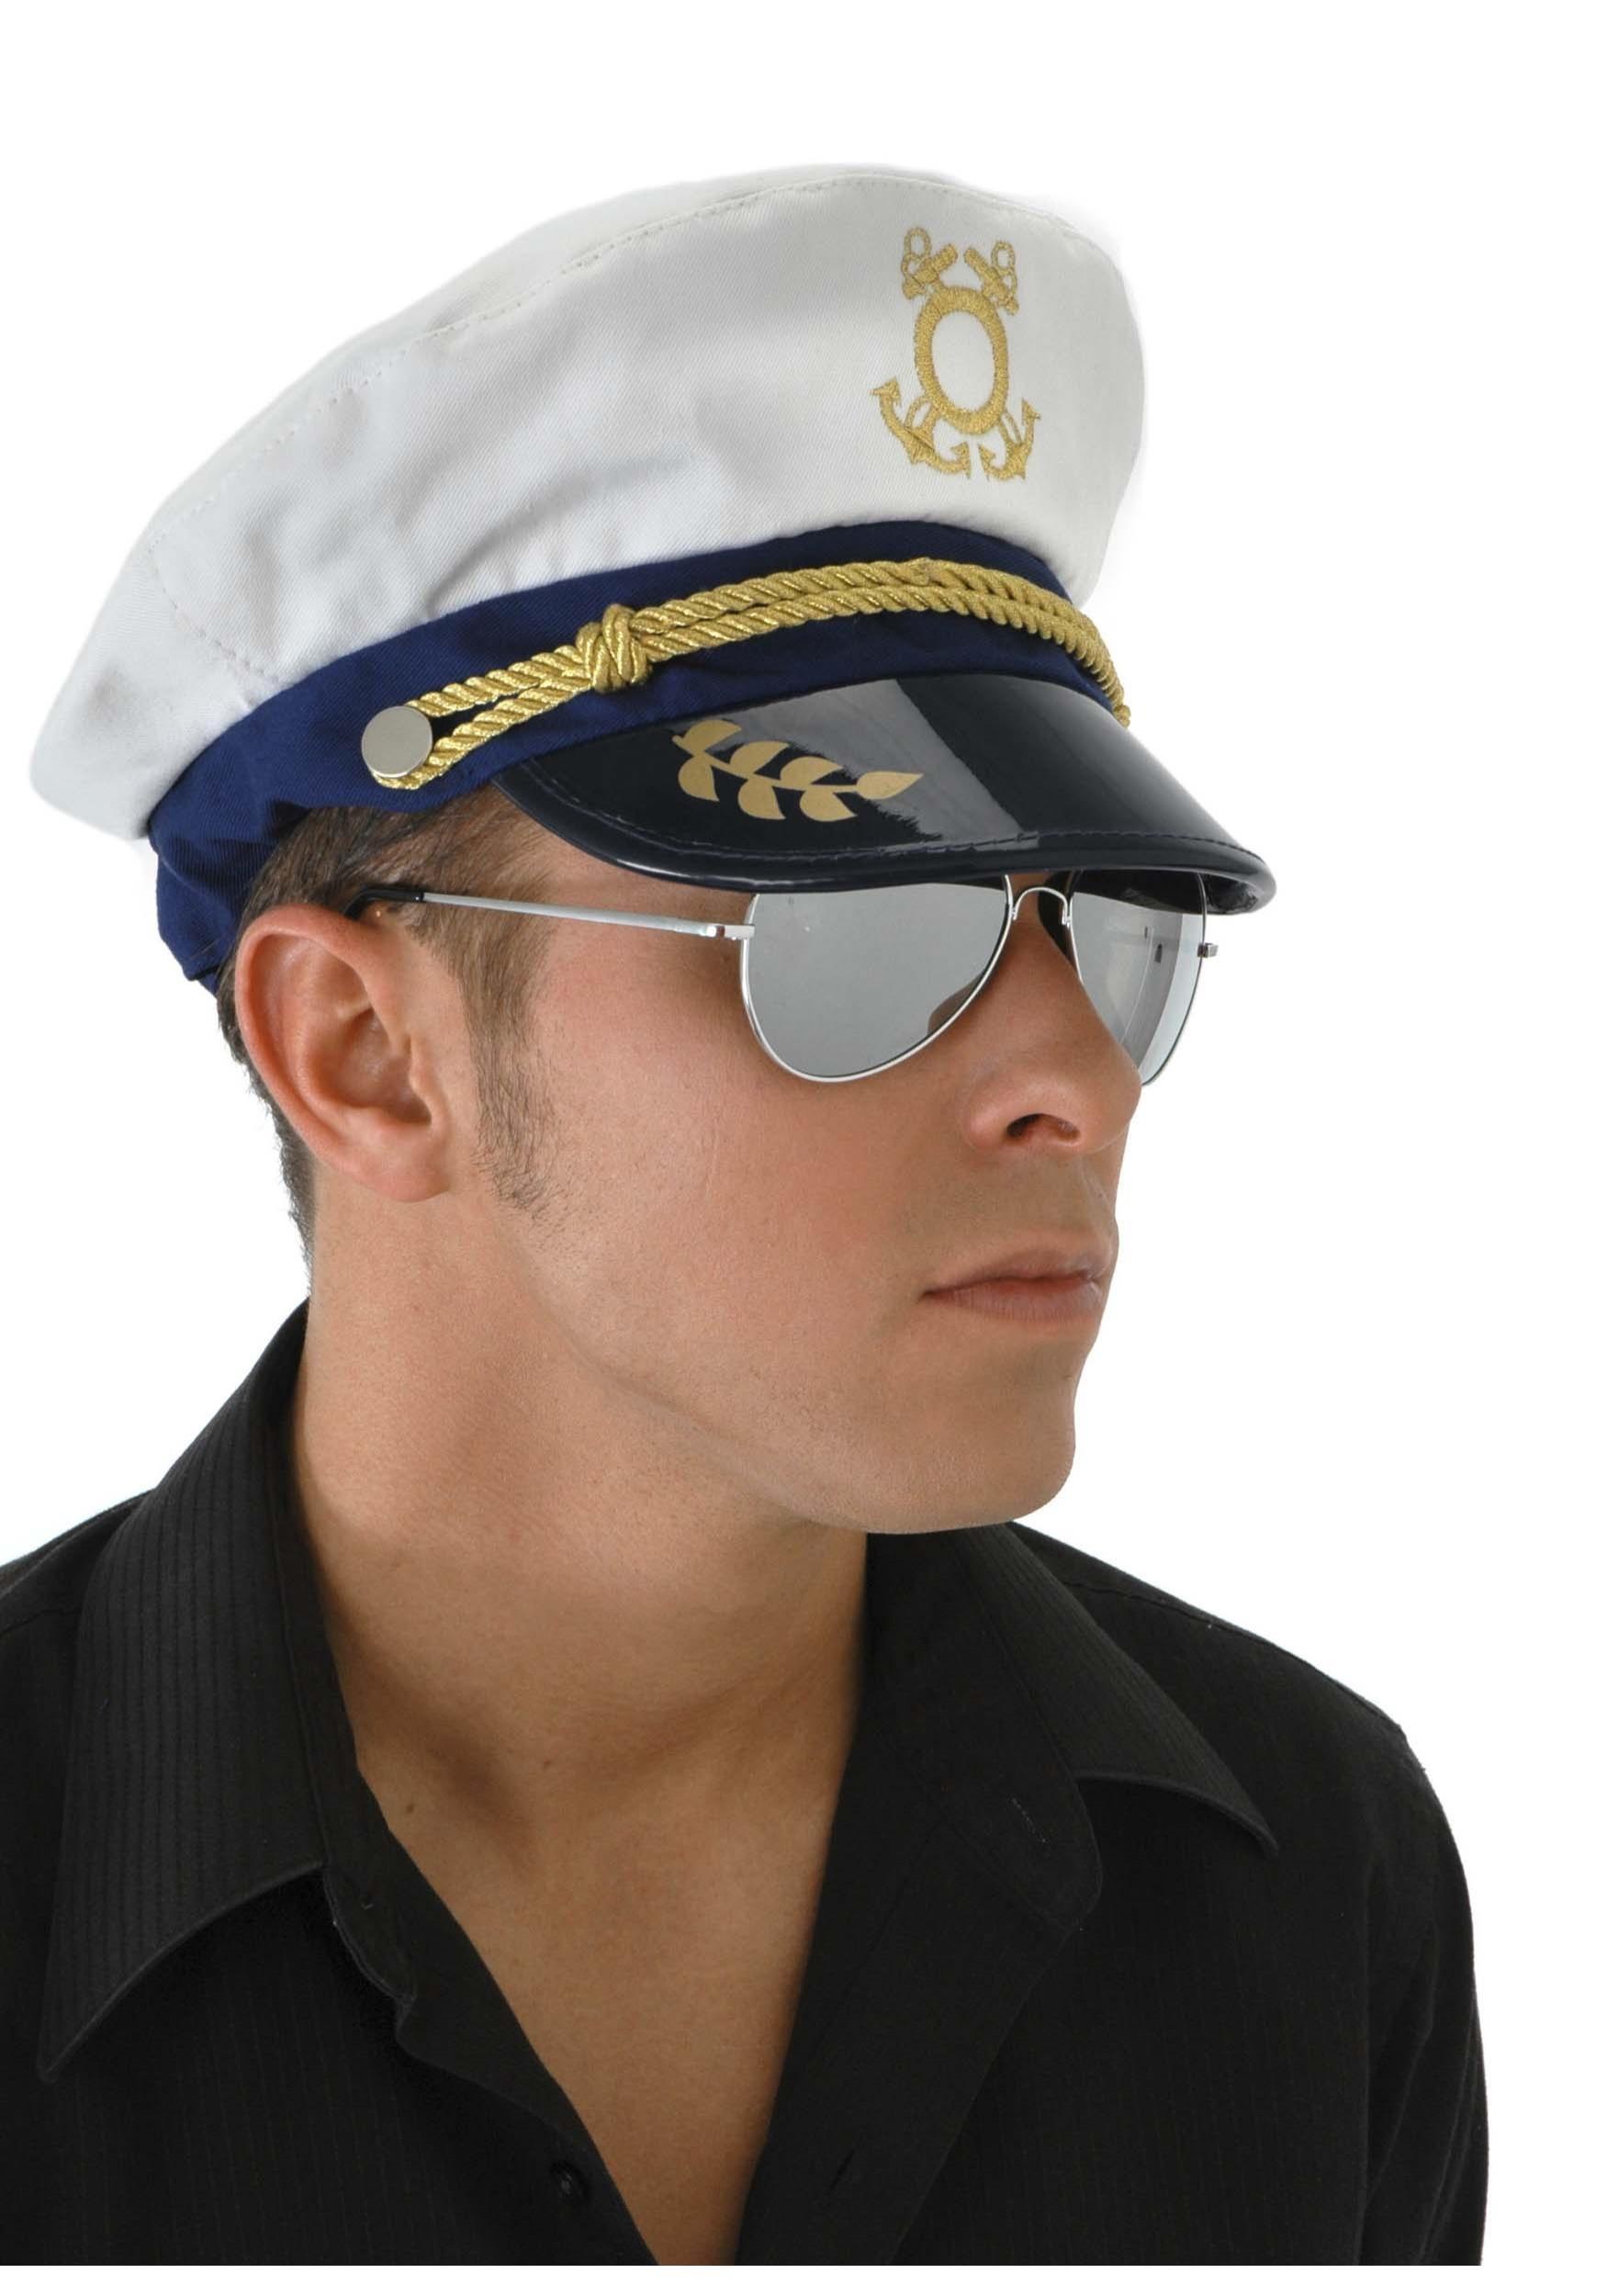 Mens Sailor Captain Hat2 1c7e80bda5